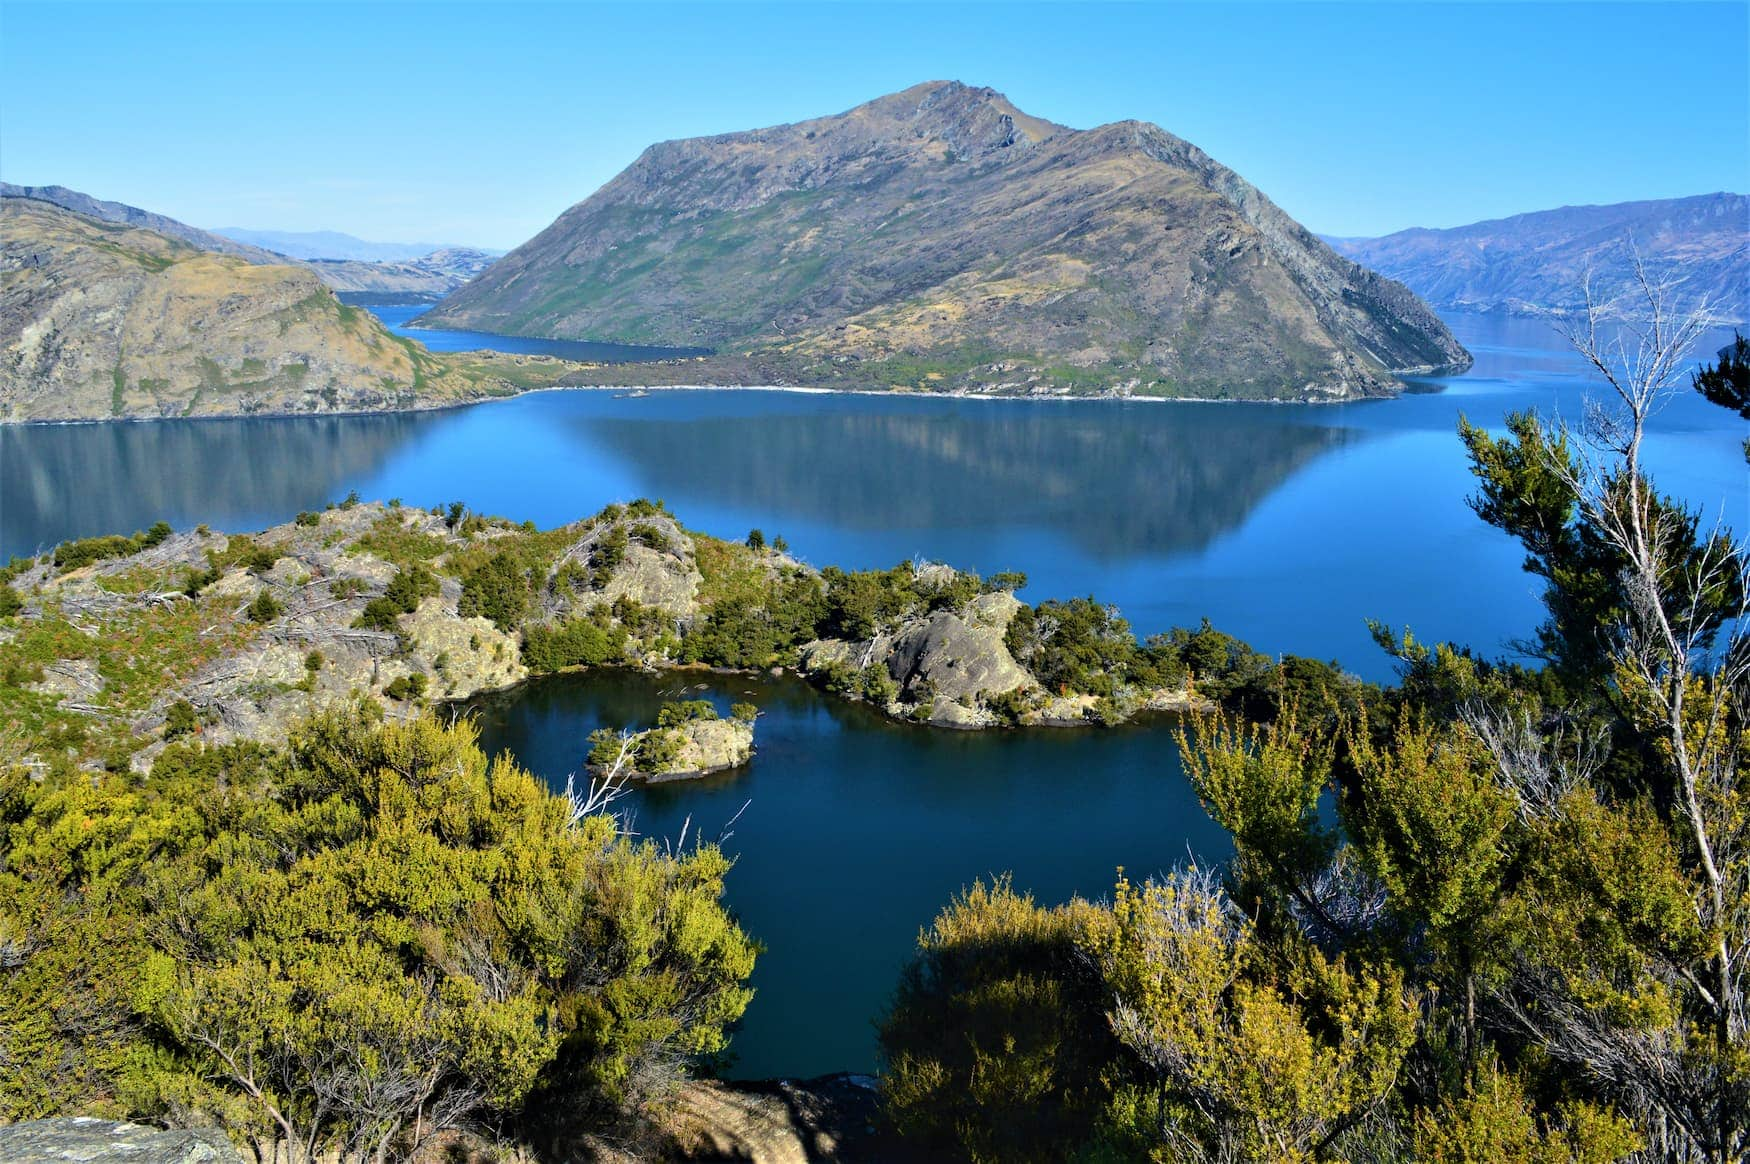 Mou Waho - Die Insel im Lake Wanaka in Neuseeland